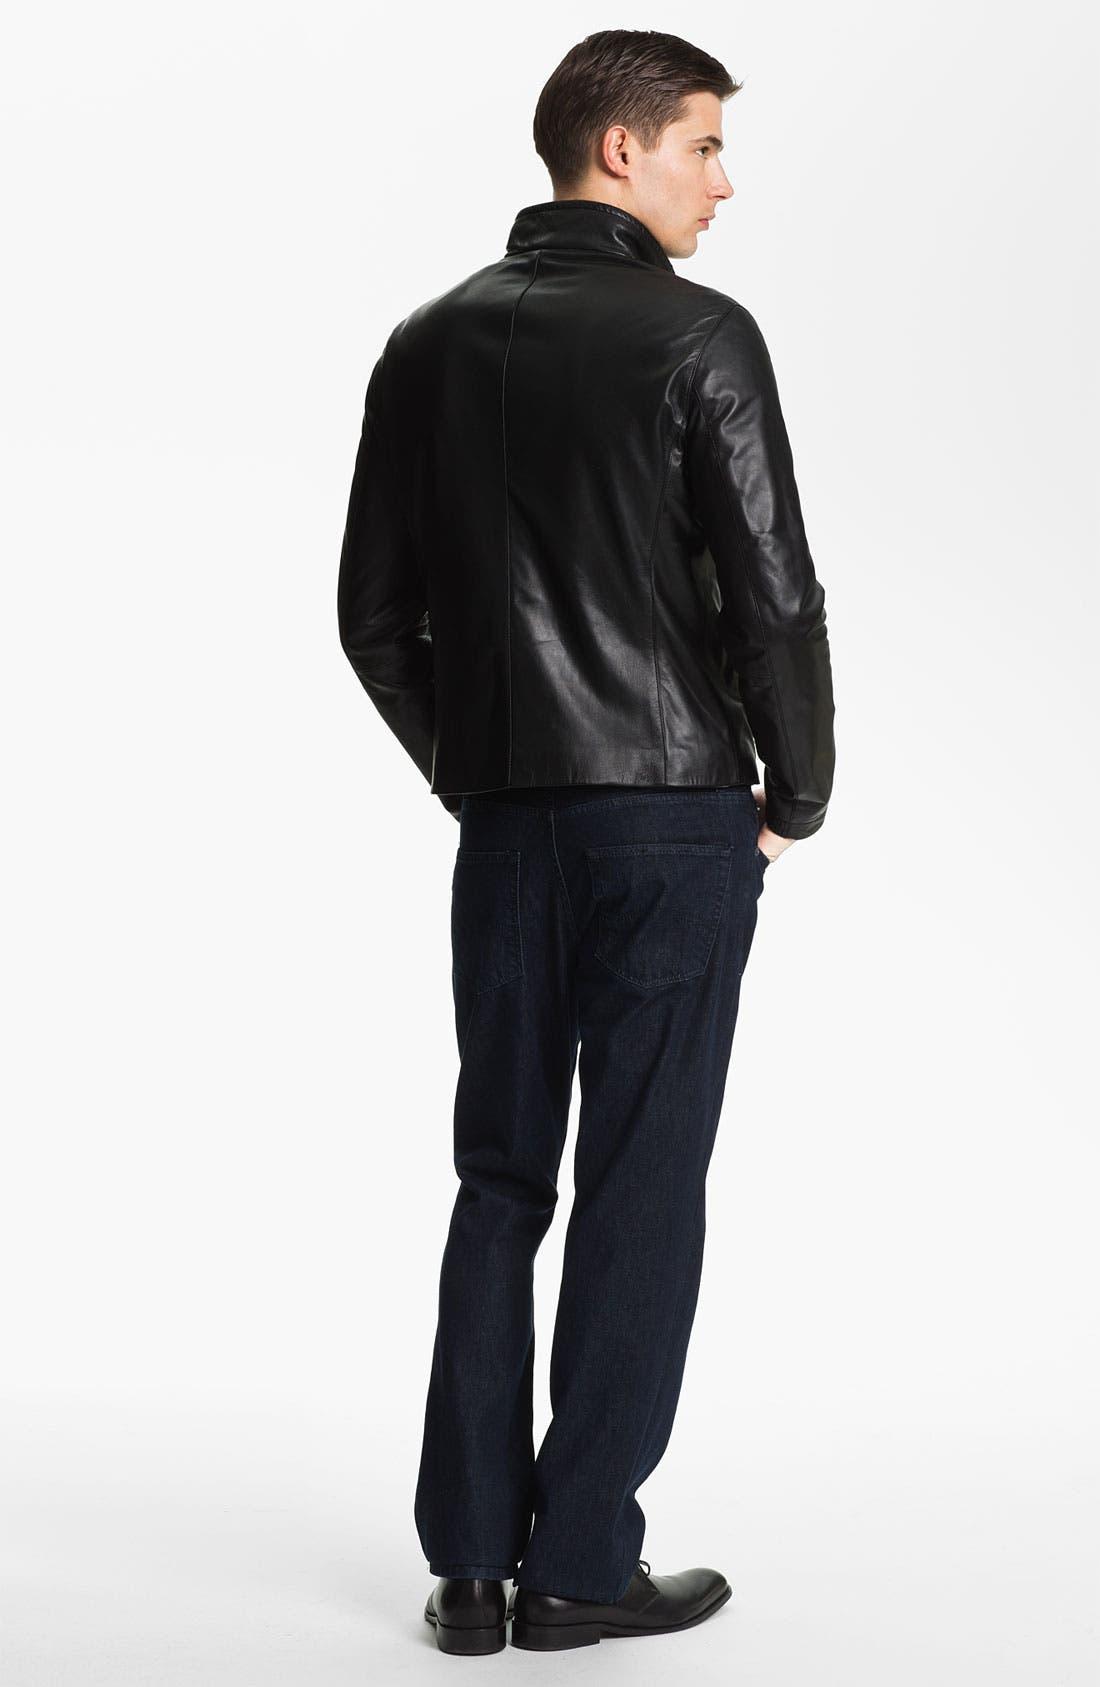 EMPORIO ARMANI,                             Armani Collezioni Blouson Leather Jacket,                             Alternate thumbnail 2, color,                             001